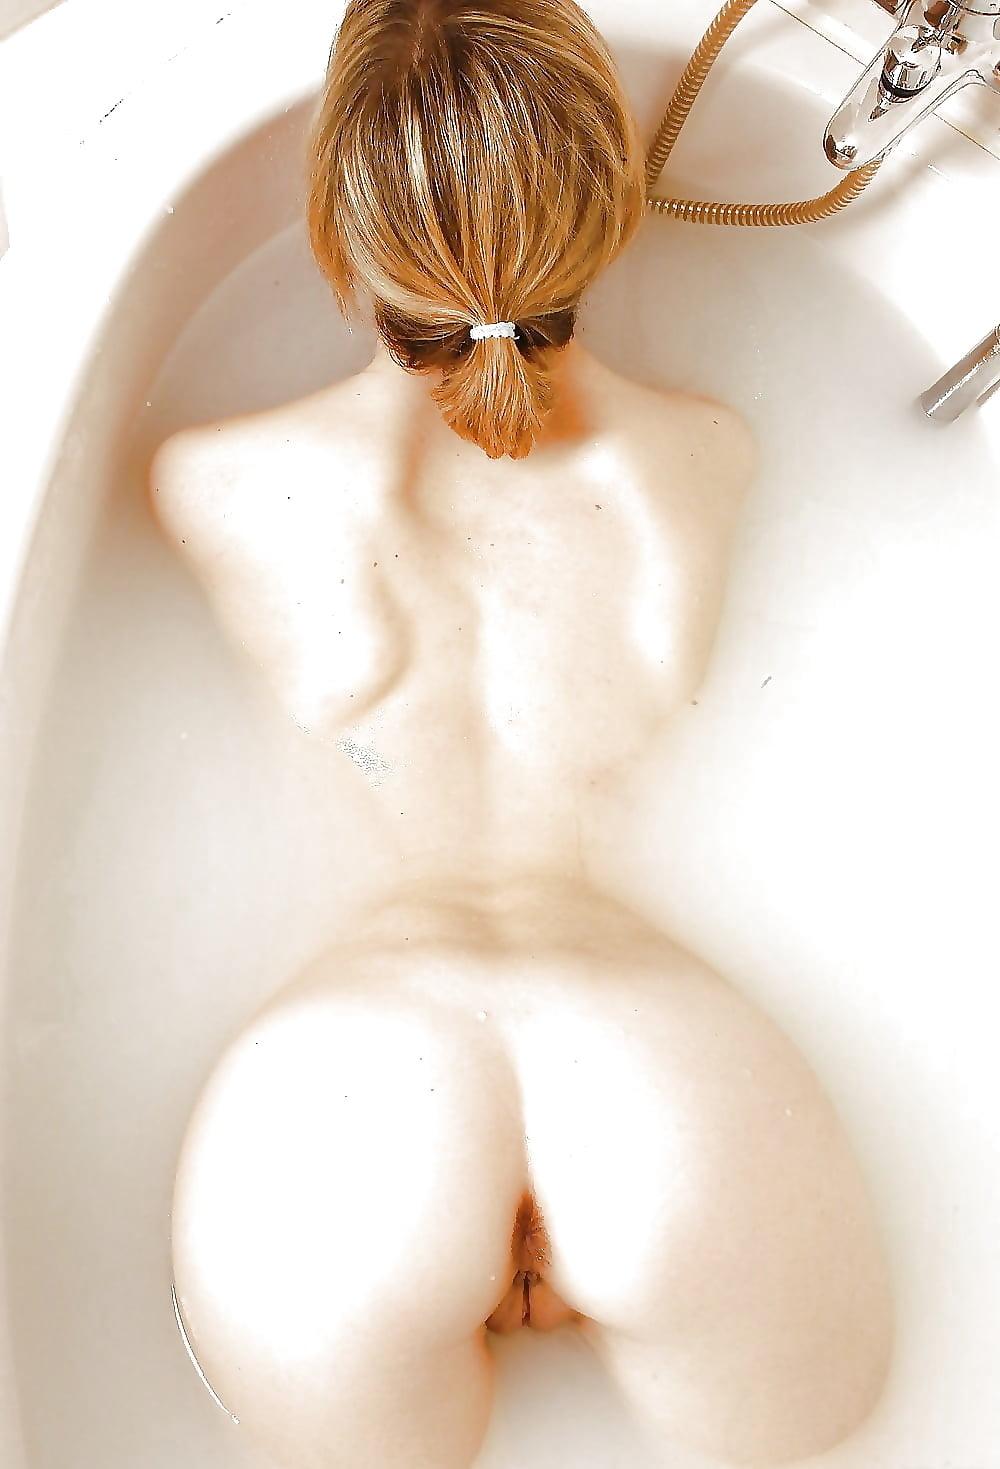 Best bathroom porn